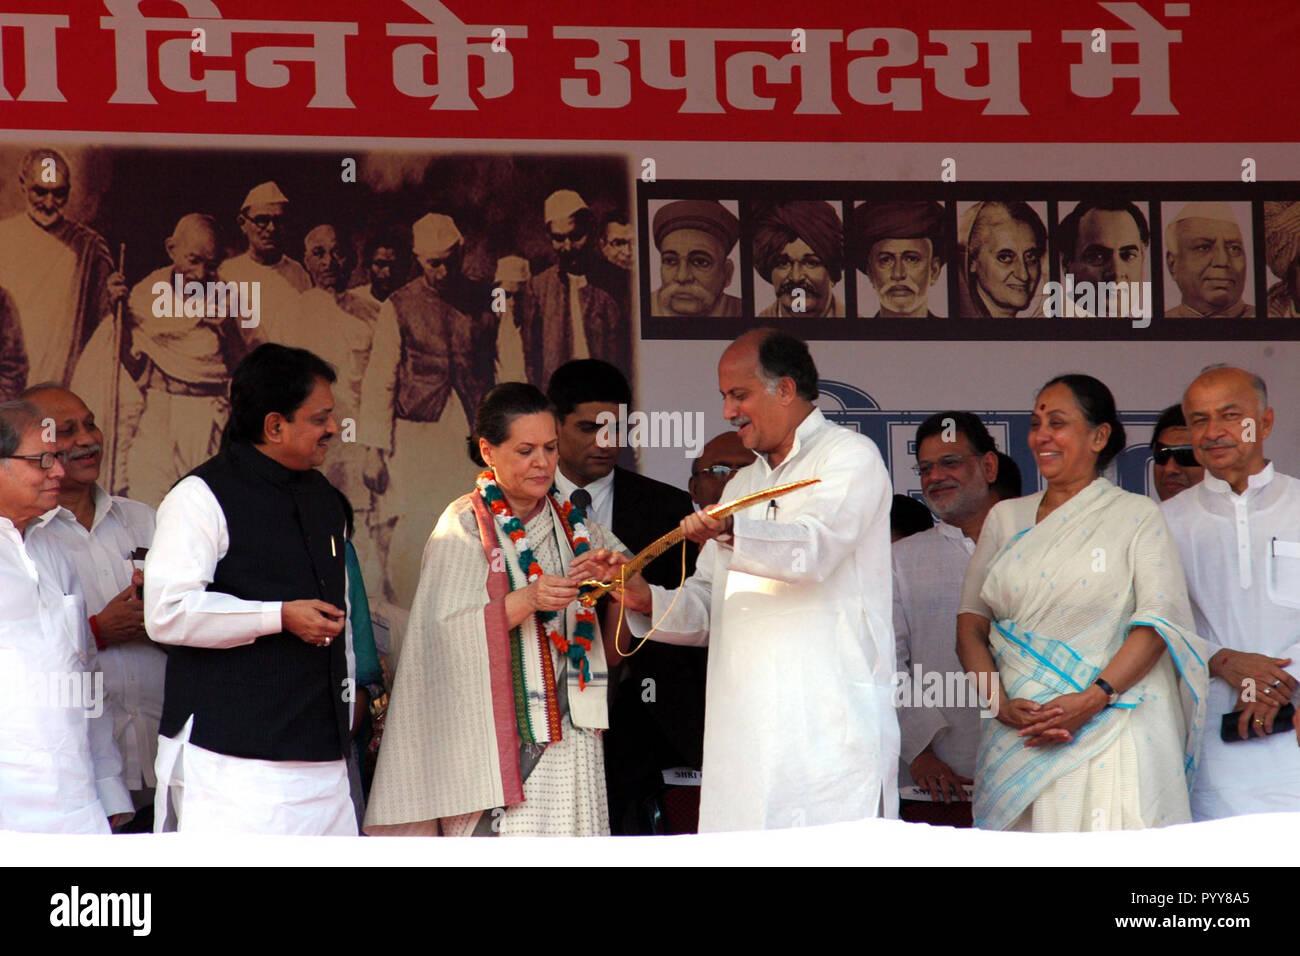 Gurudas Kamat presented sword to Sonia Gandhi, Shivaji Park, Mumbai, Maharashtra, India, Asia Stock Photo